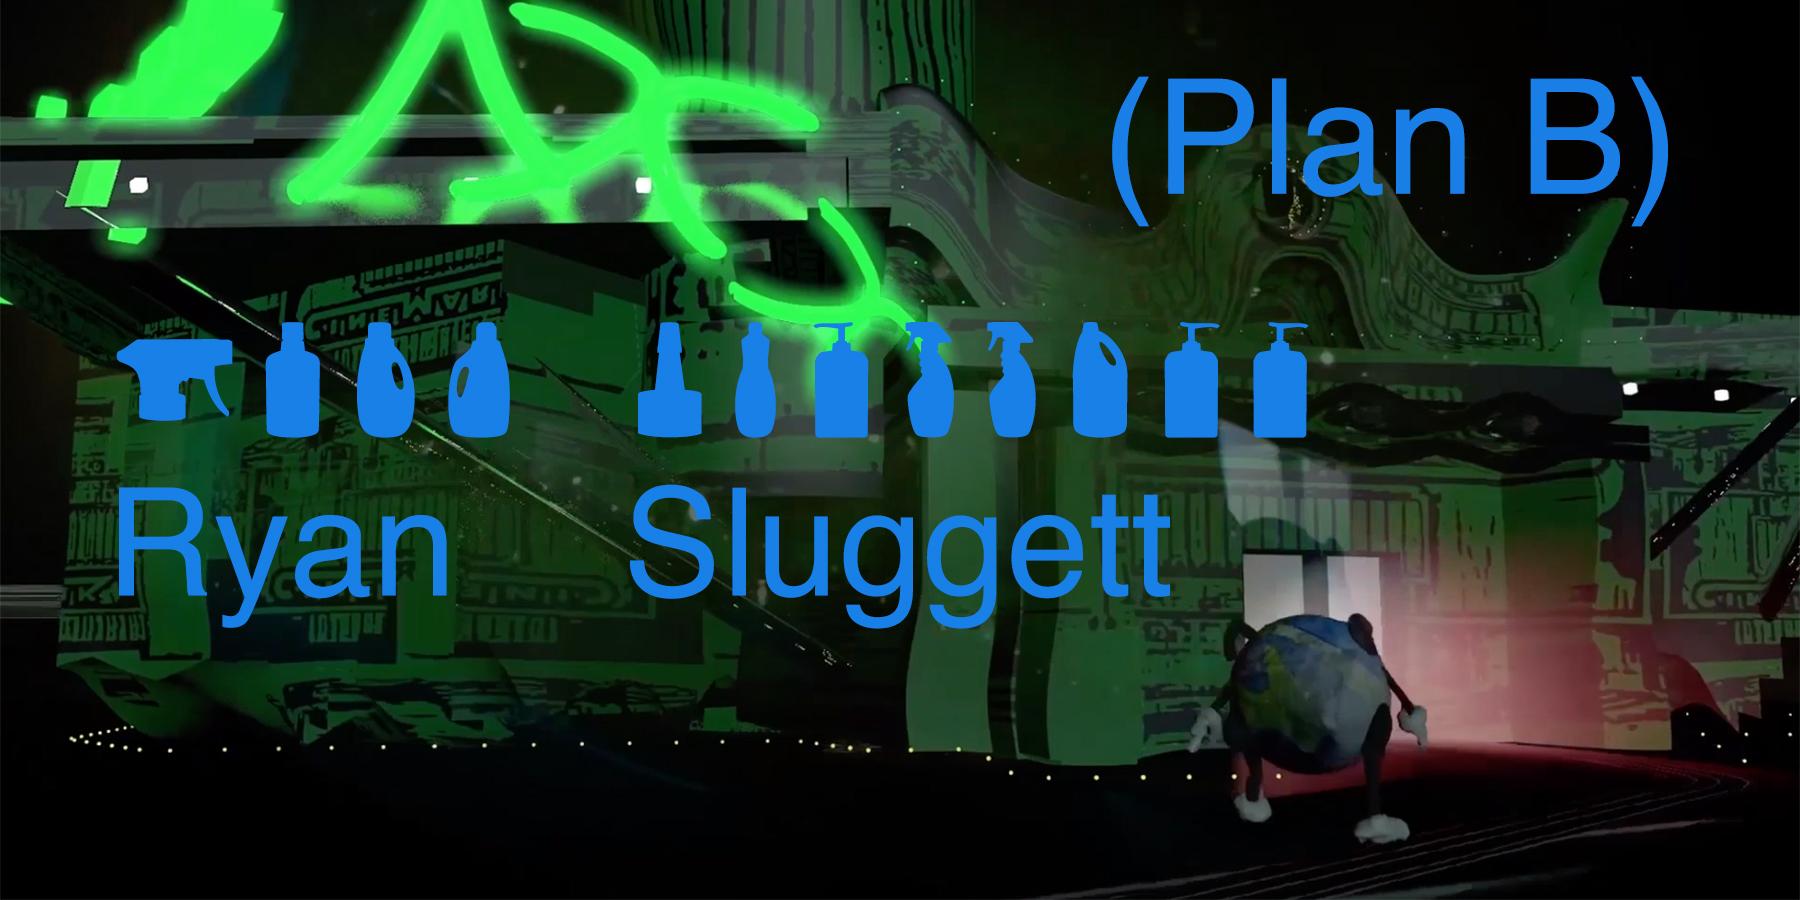 Ryan Sluggett: Untitled! Untitled! (Ed Terrestrial), coming this FALL.